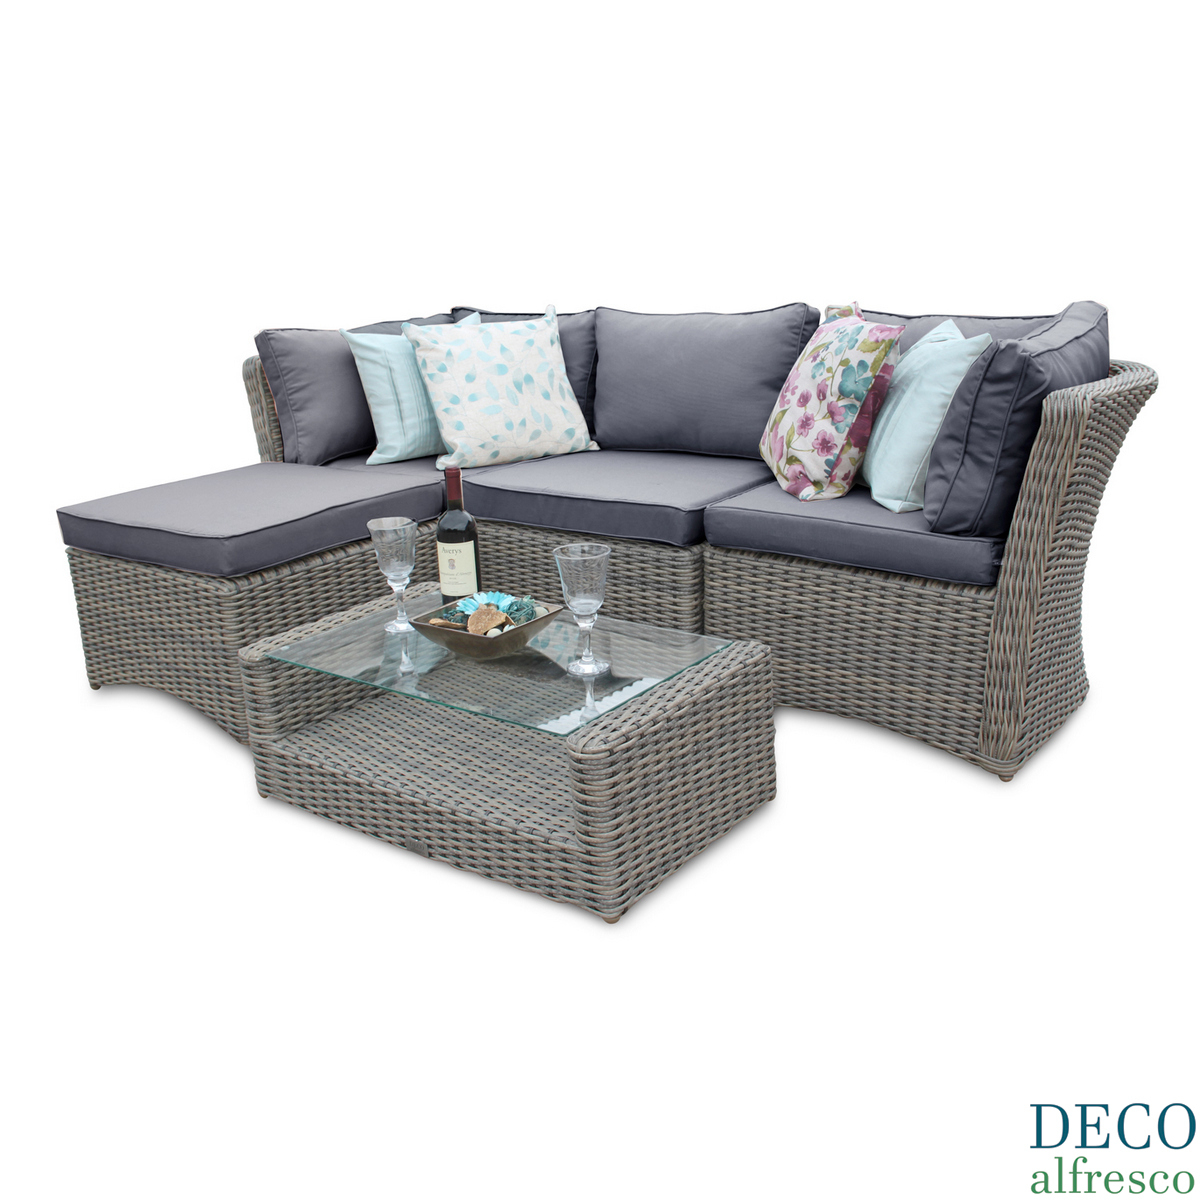 5Pc High Back Modular Corner Rattan Garden Furniture – Deco Alfresco With Regard To London Dark Grey Sofa Chairs (Image 2 of 20)